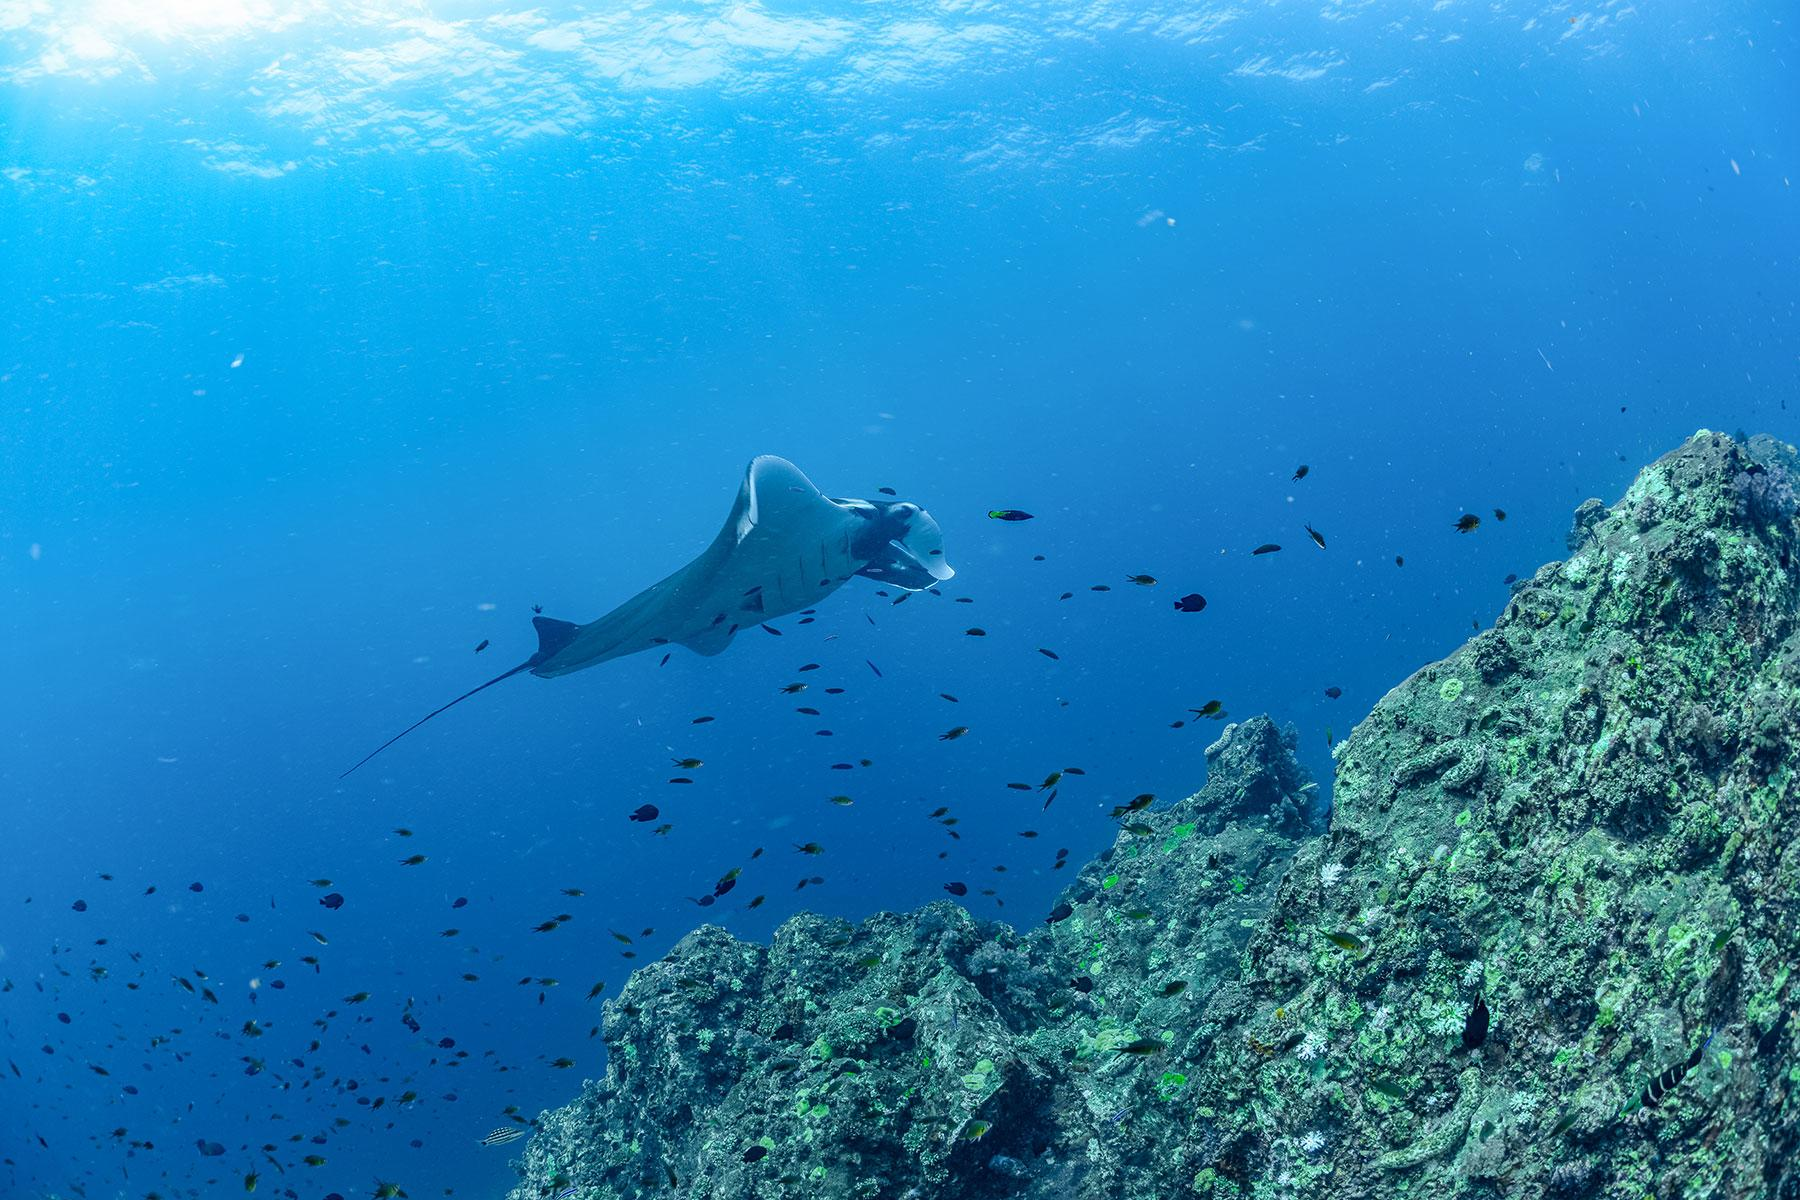 11_Thailand_Snorkeling_Diving_Hin_Daeng_dreamstime_133907232